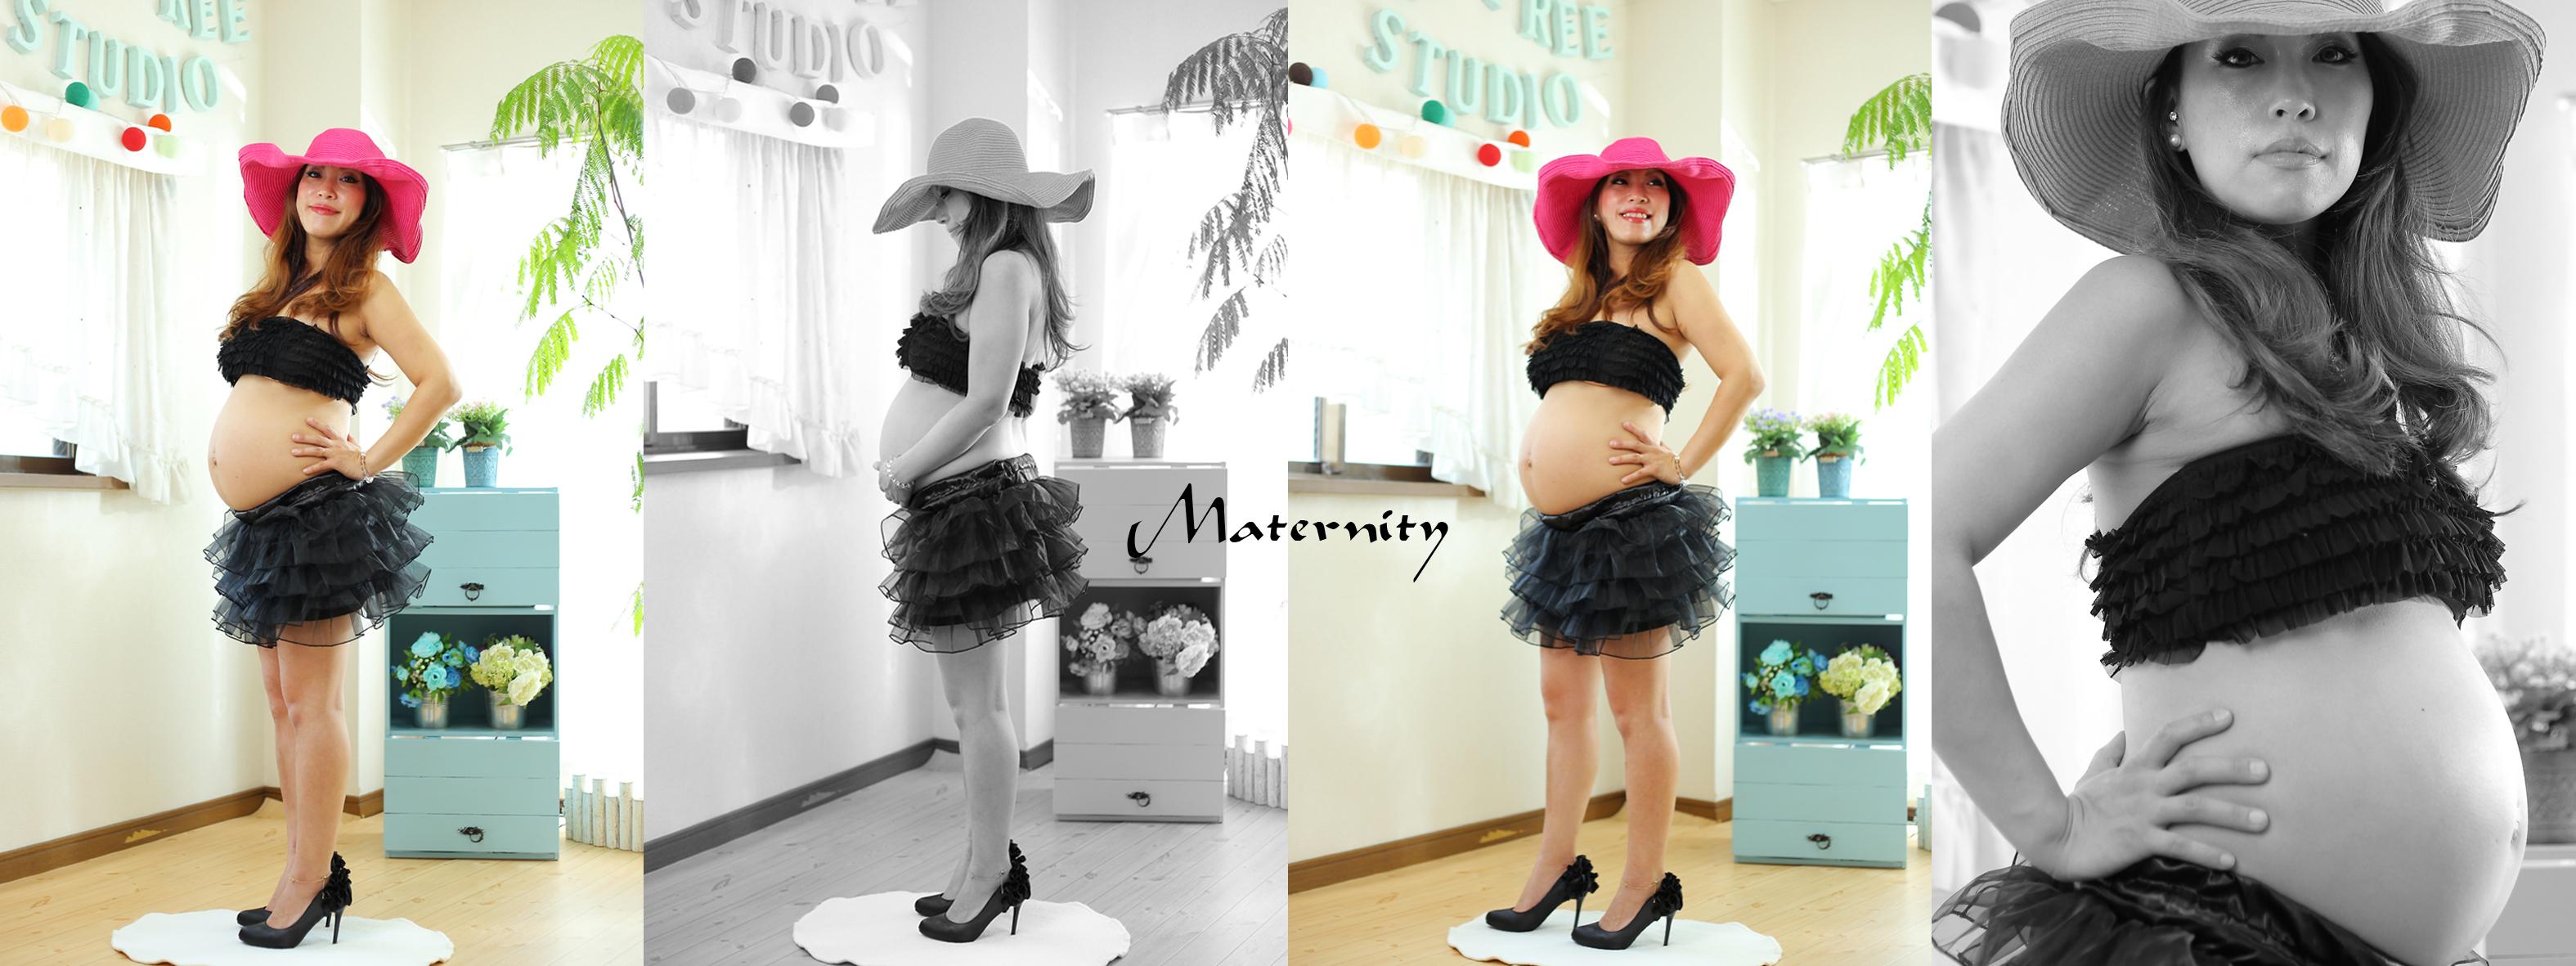 littletree maternity20.JPG